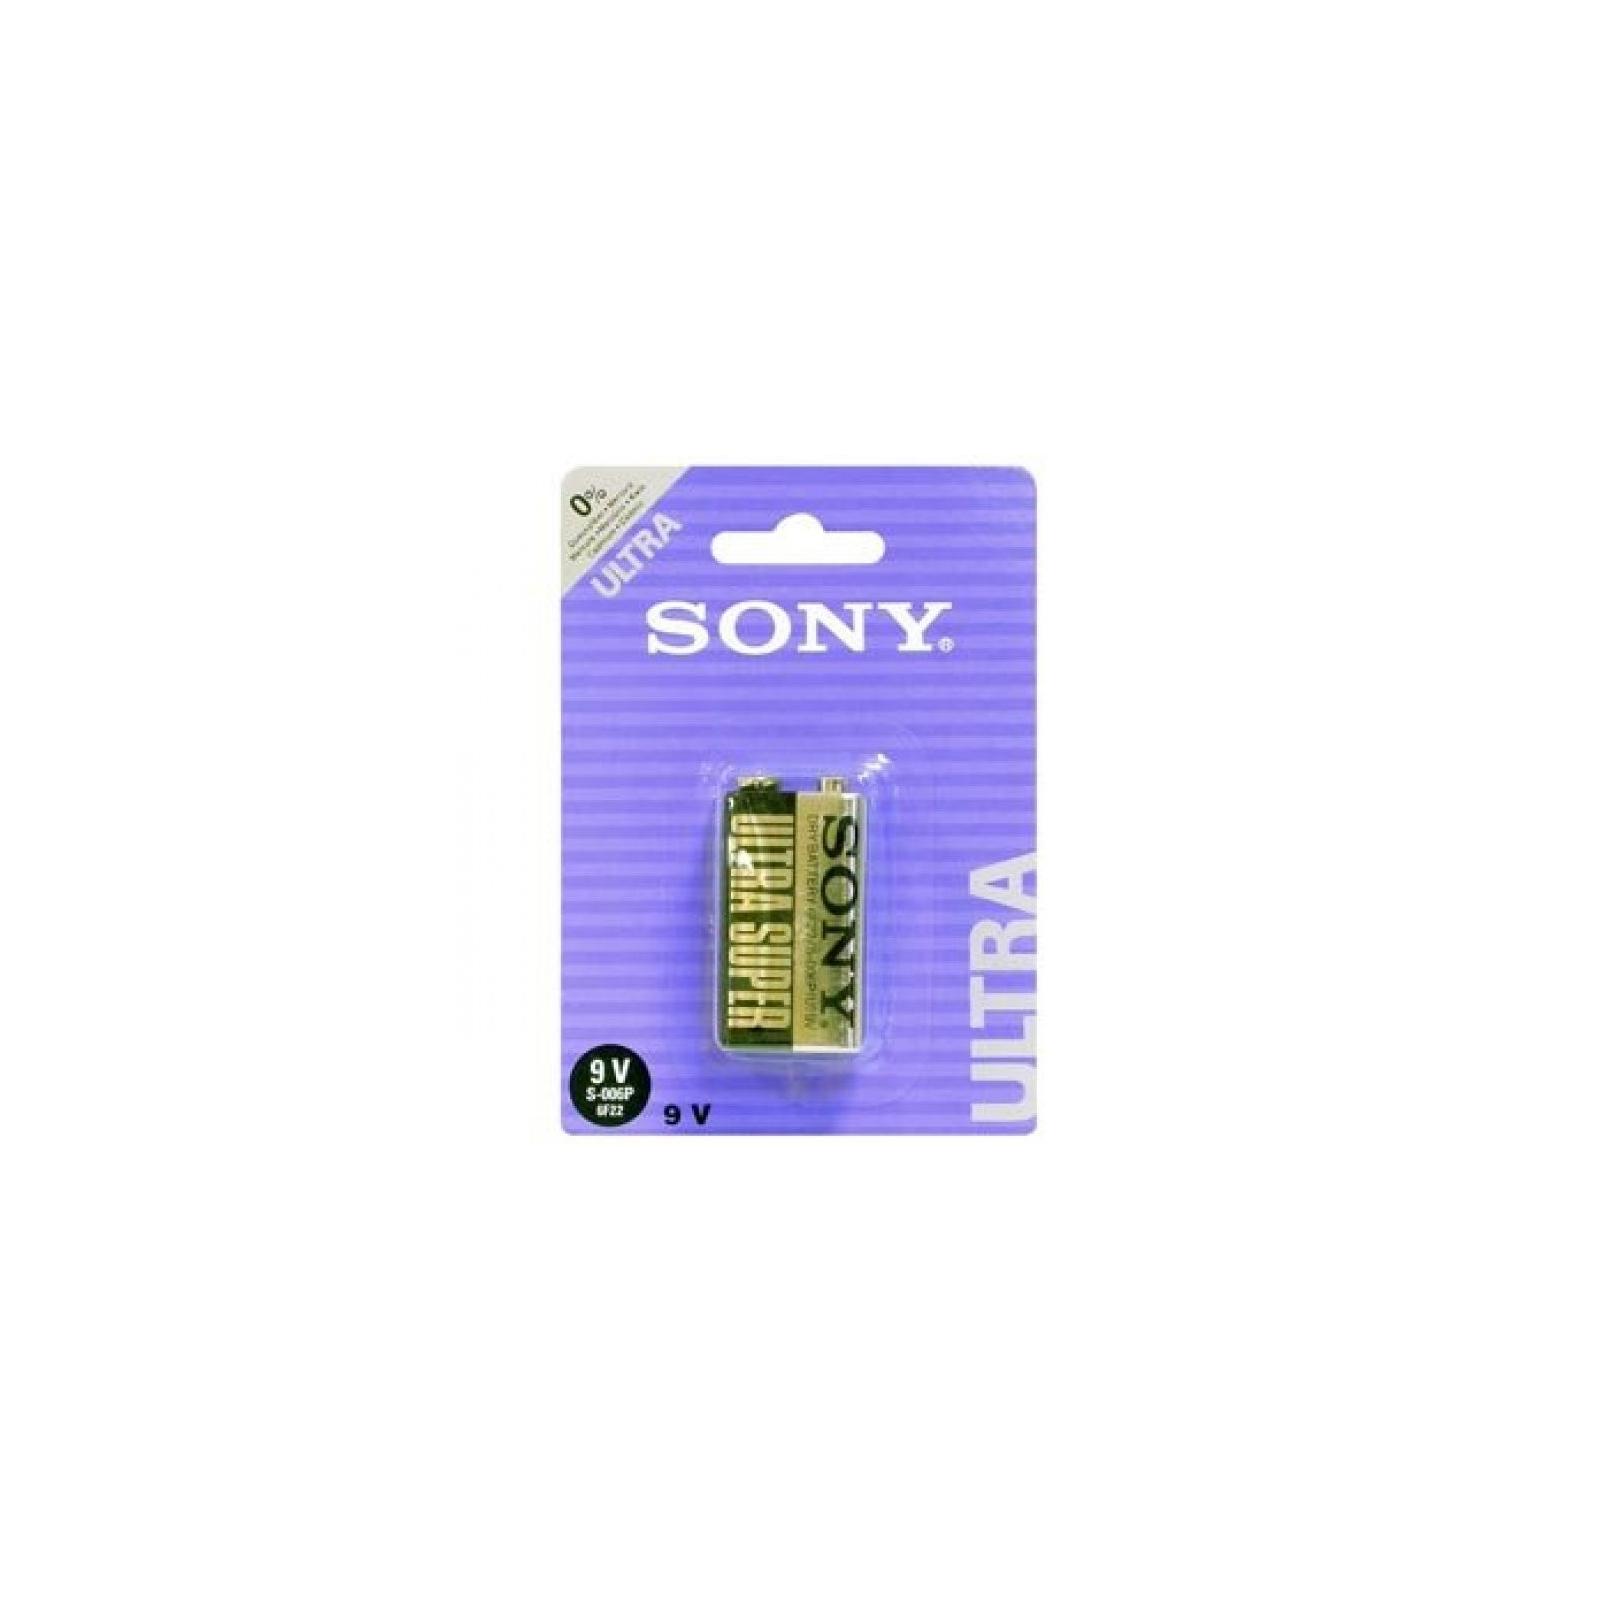 Батарейка SONY Крона SONY 6F22 9V (S006PB1A)